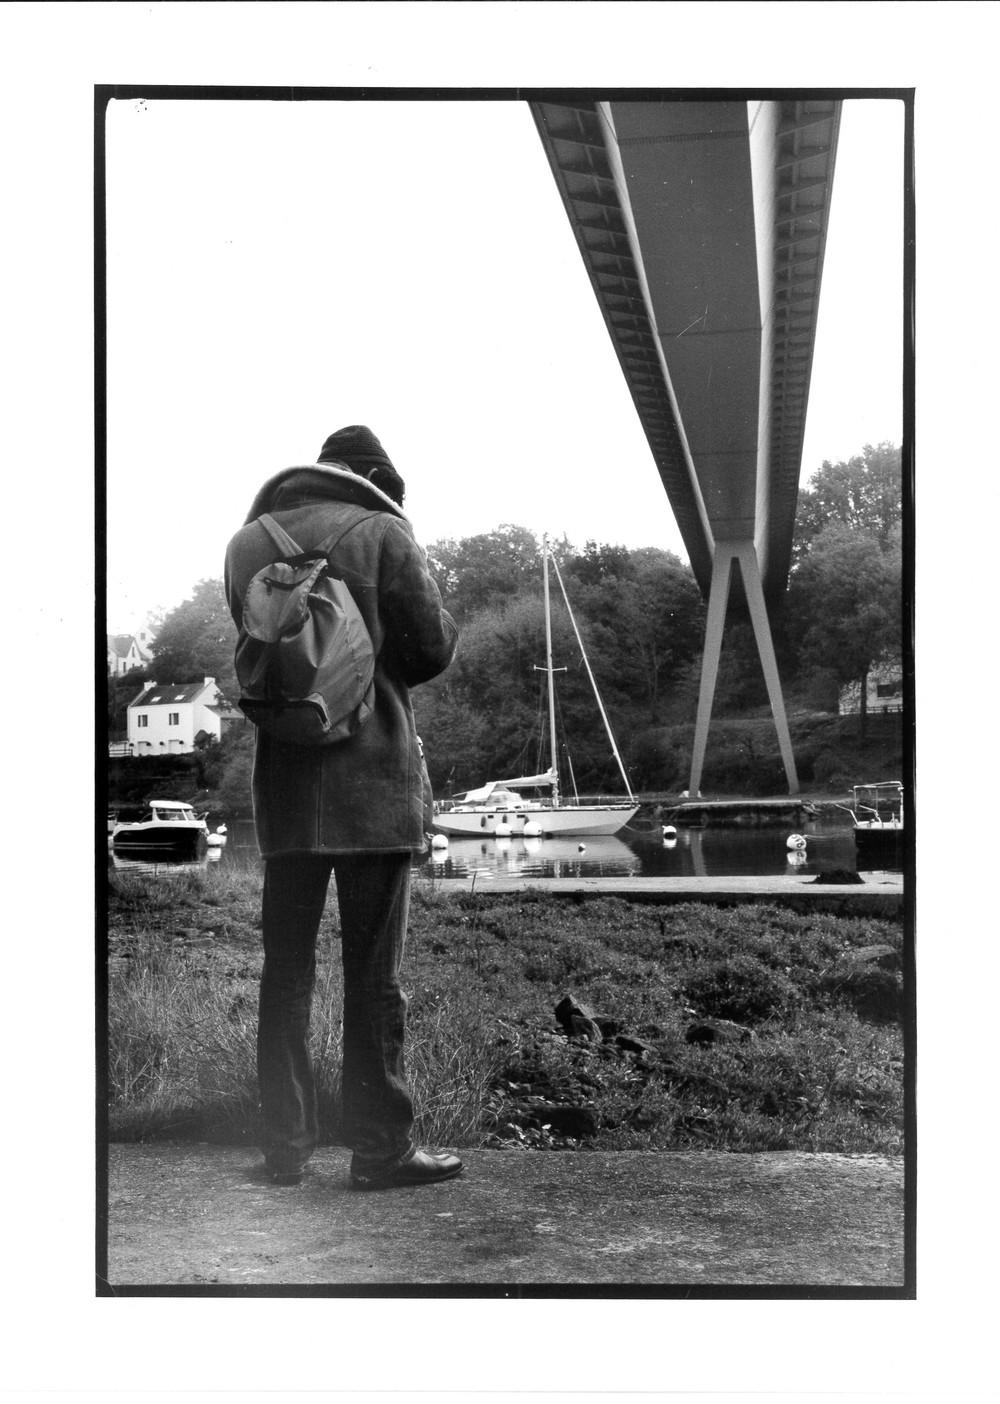 Pont, Le Bono 2012 24x36 cm